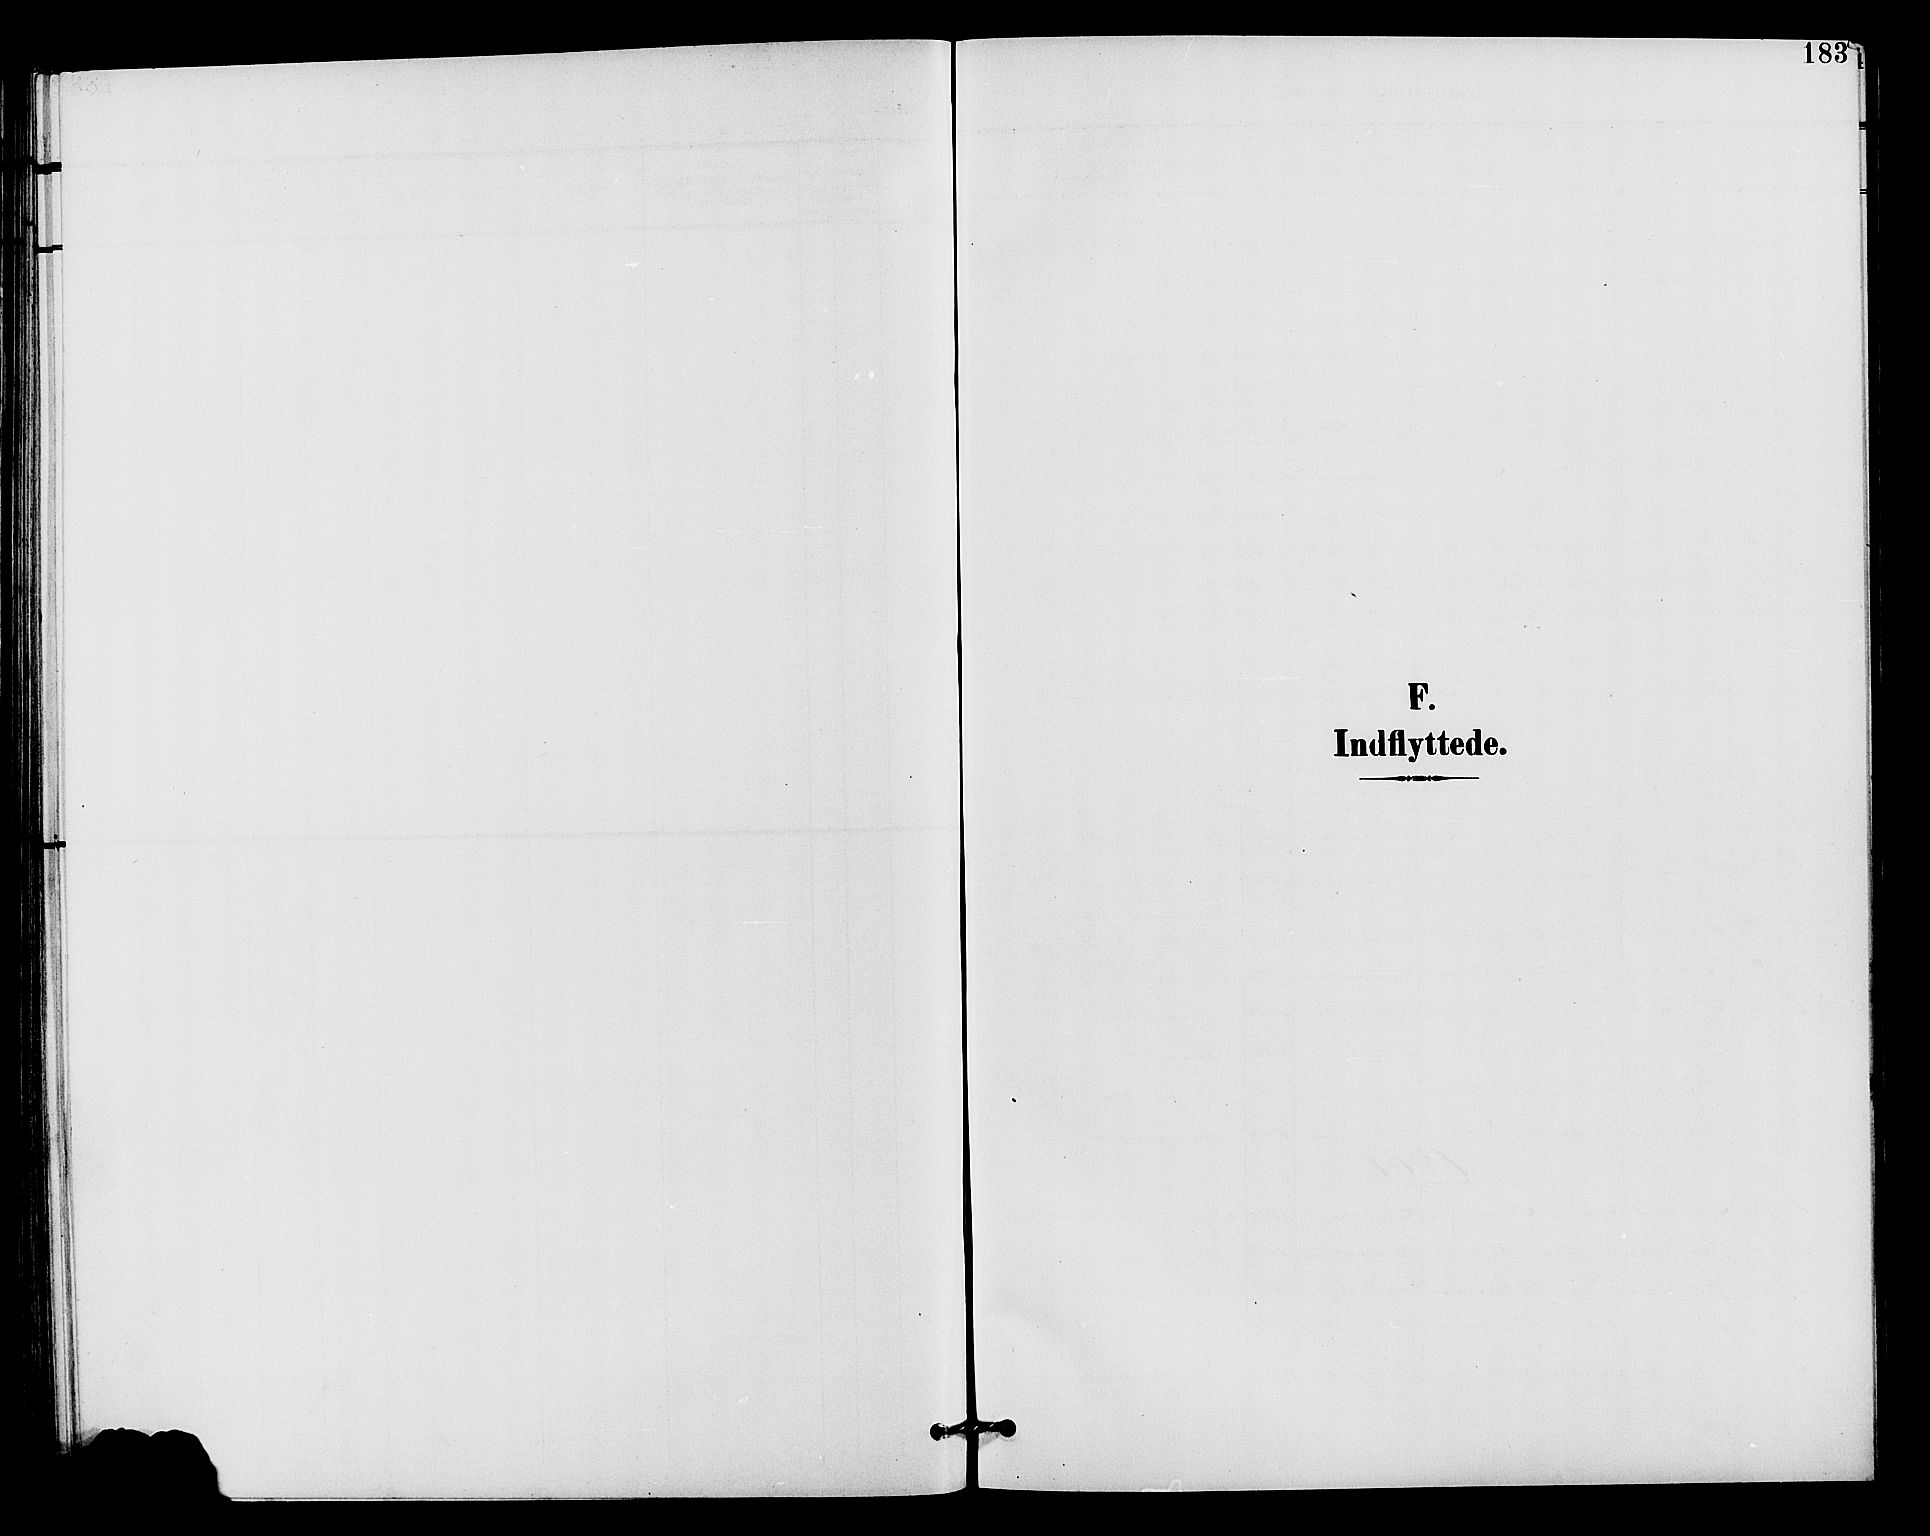 SAH, Vardal prestekontor, H/Ha/Hab/L0011: Klokkerbok nr. 11, 1899-1913, s. 183